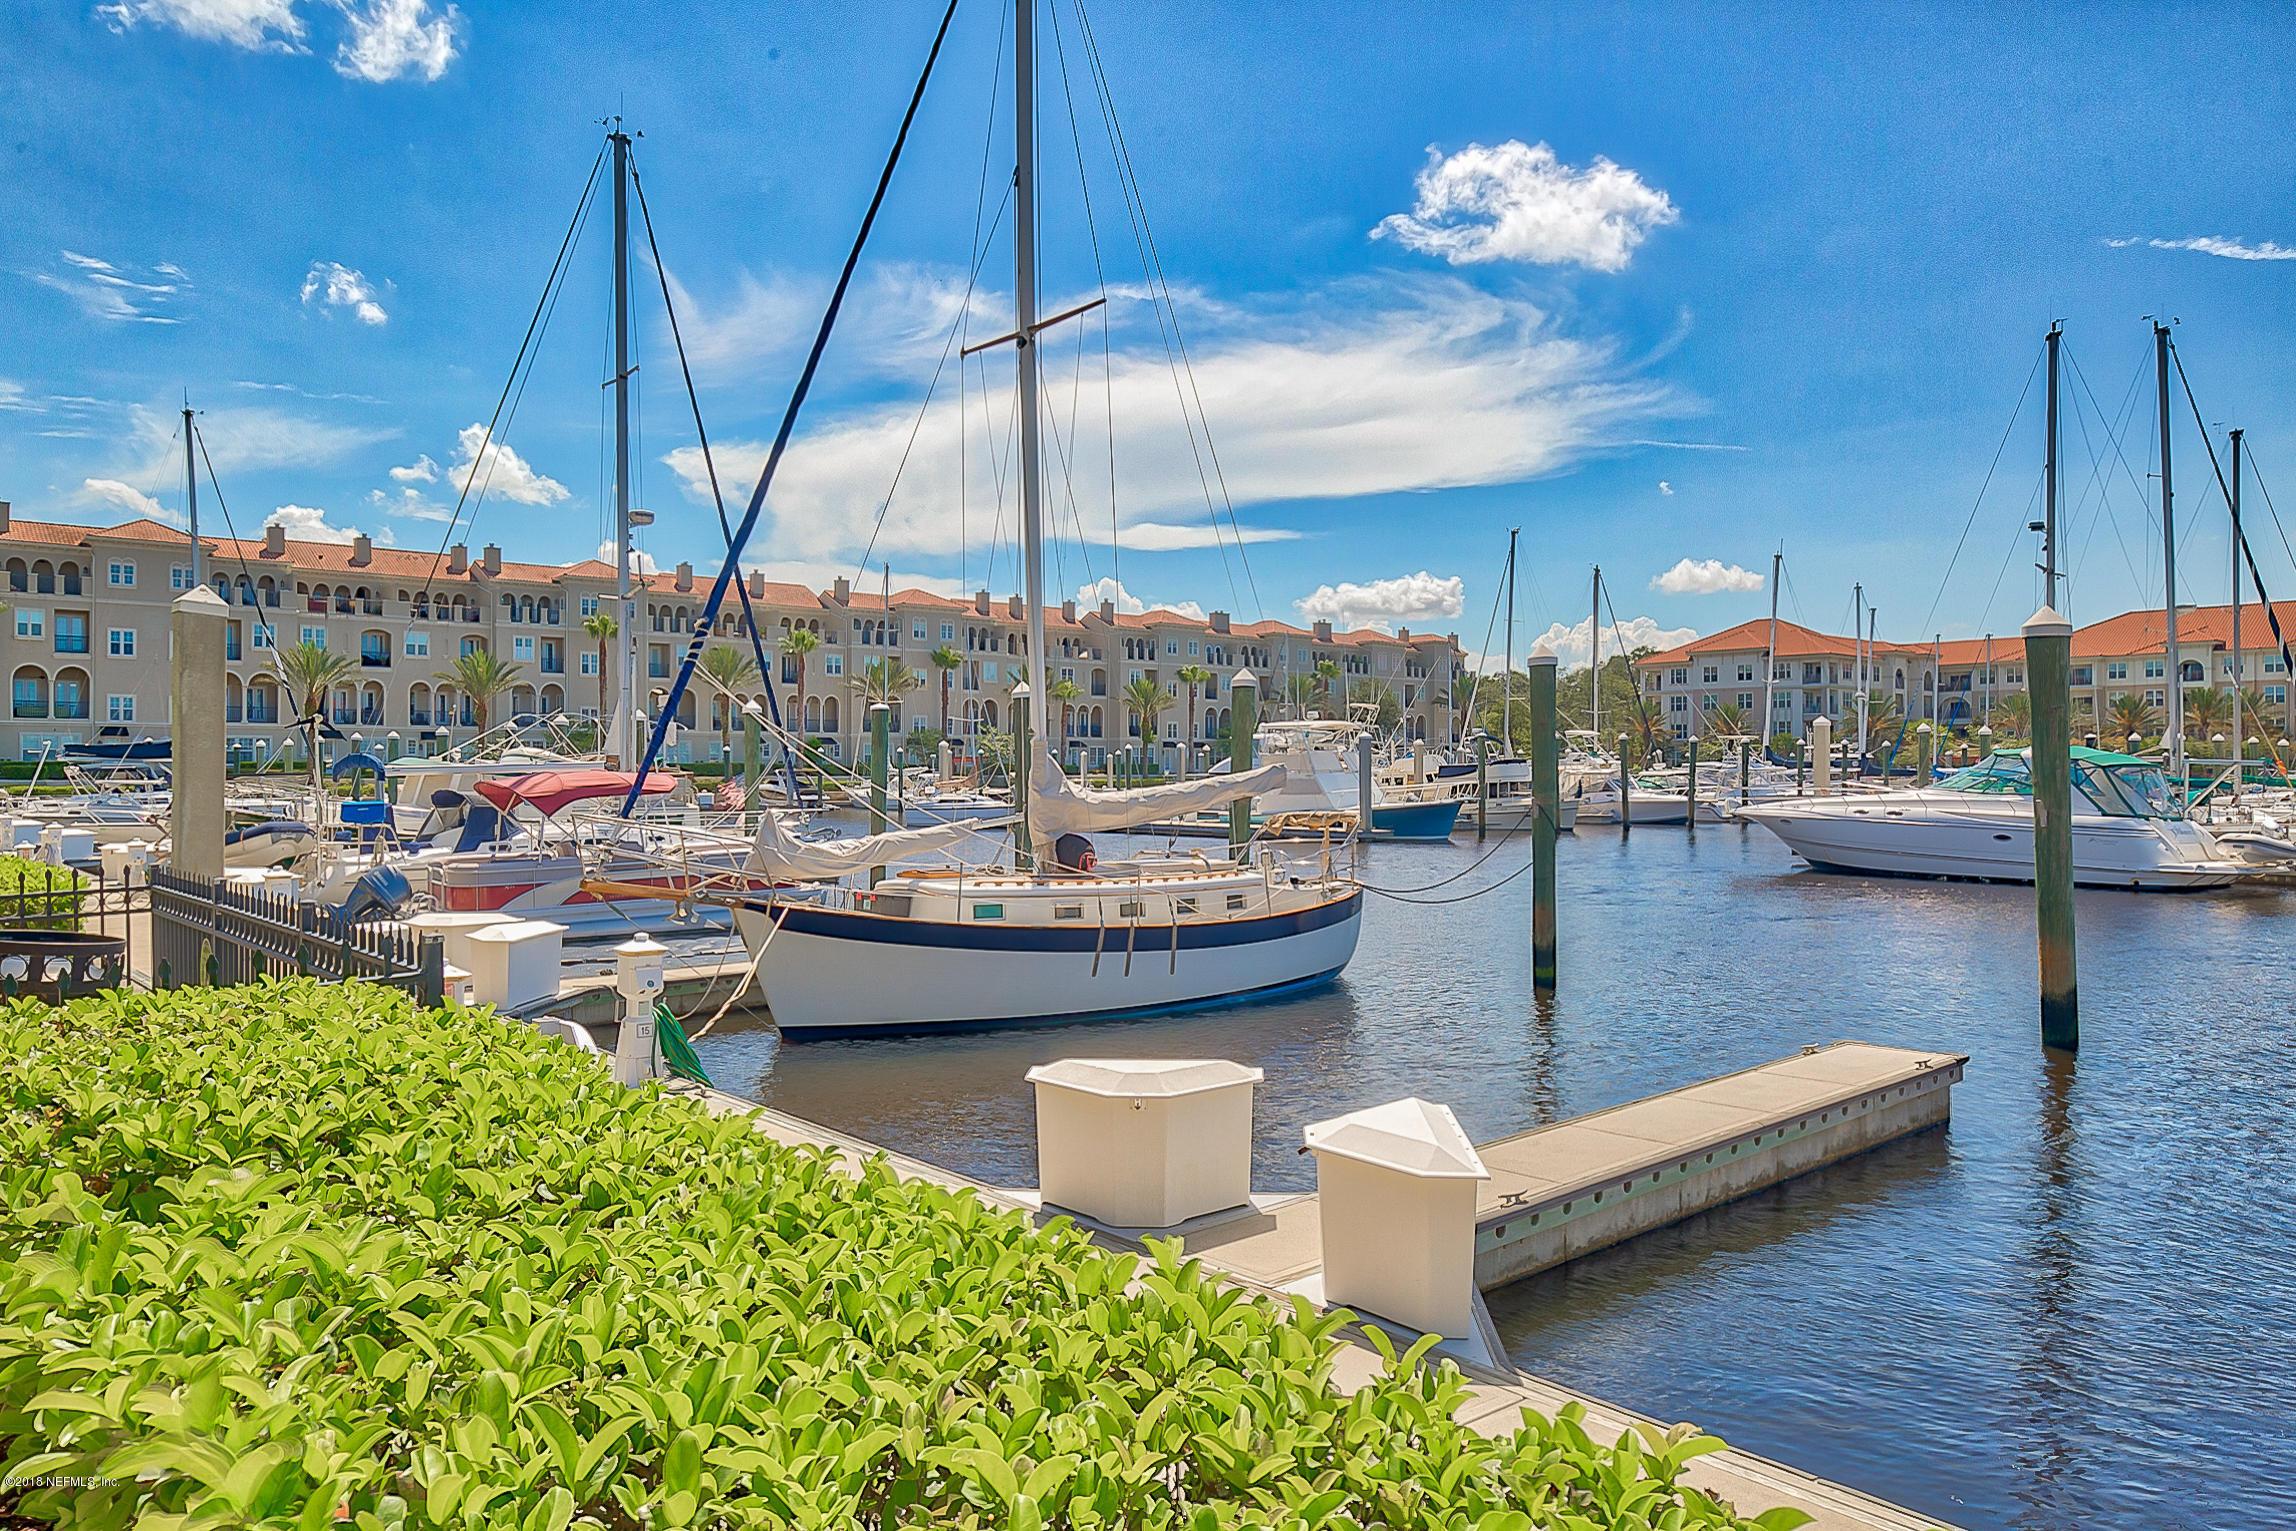 0 ATLANTIC, JACKSONVILLE, FLORIDA 32224, ,Residential,For sale,ATLANTIC,1052518